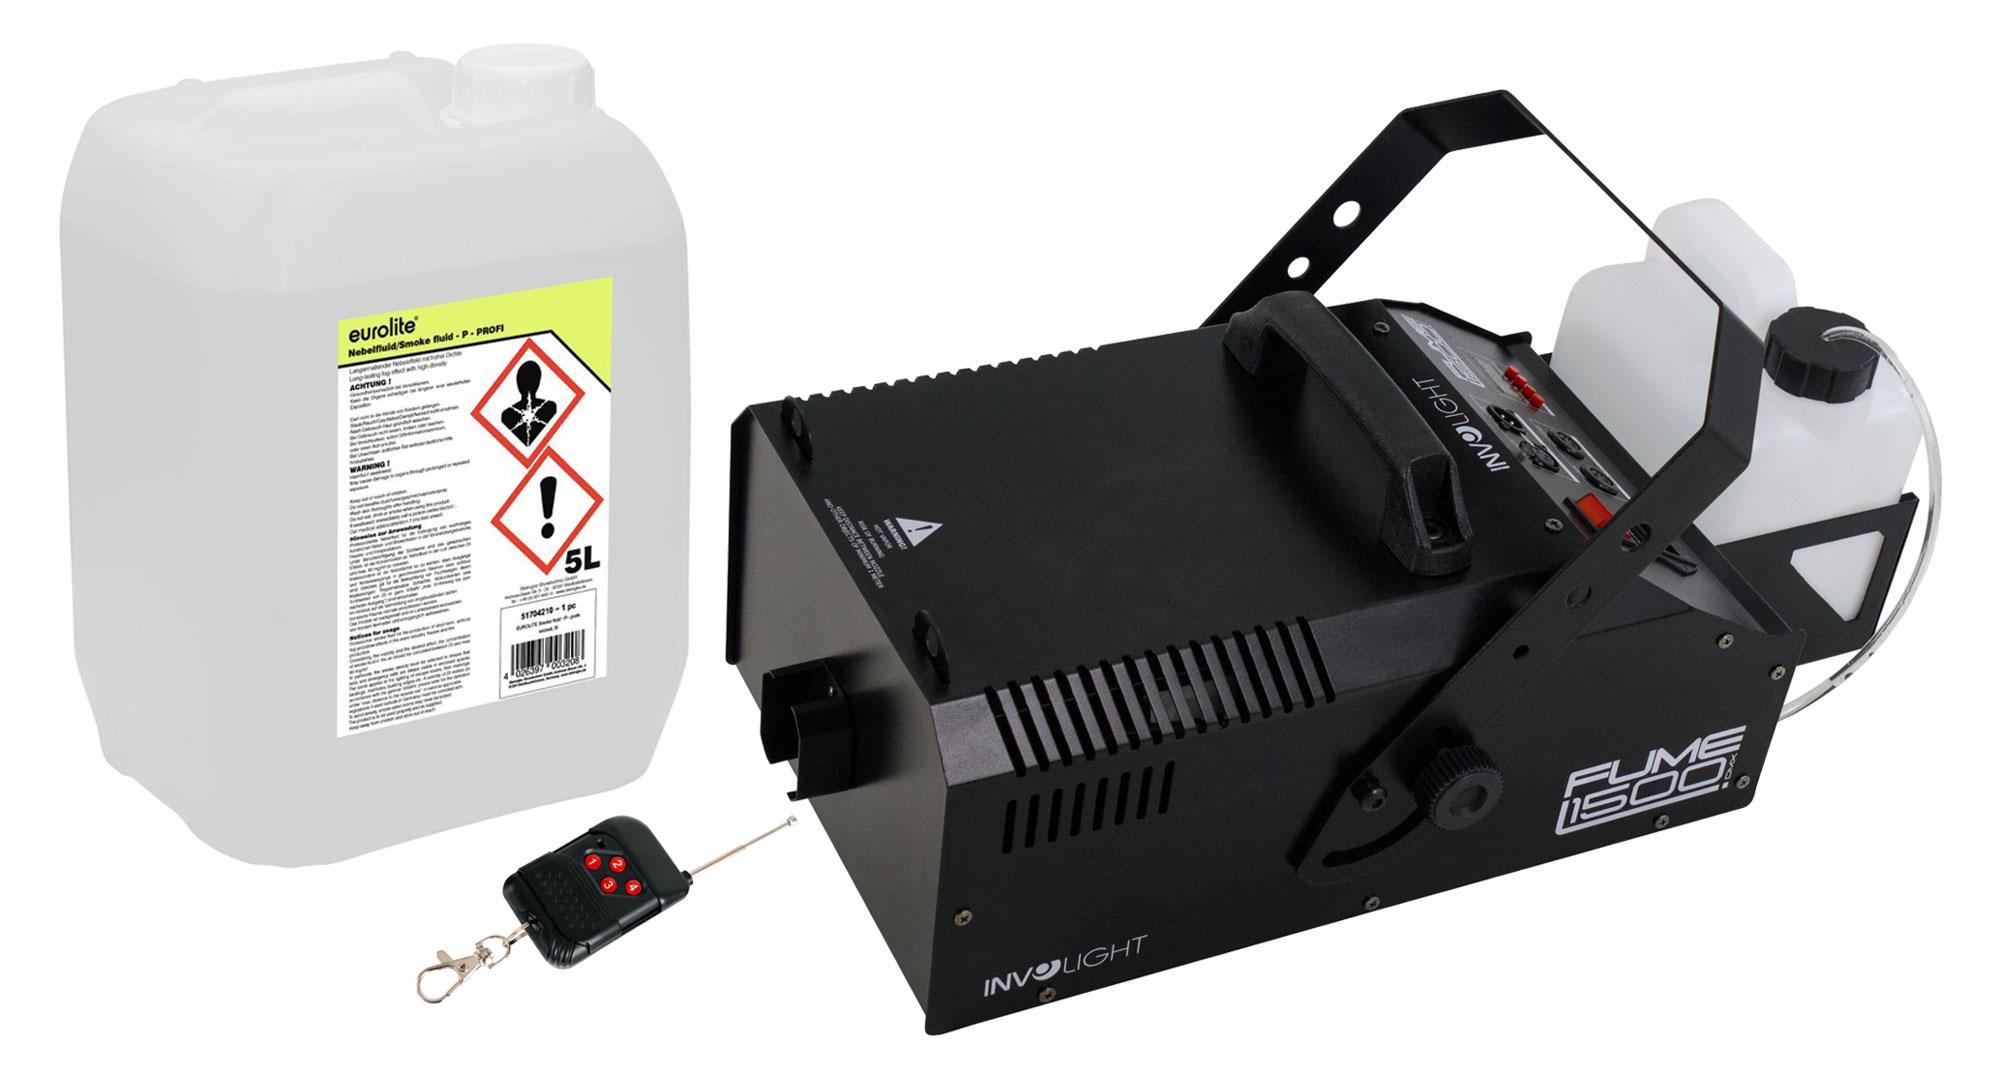 Nebeleffekte - Involight Fume 1500 DMX Nebelmaschinen Set inkl. Smoke Fluid, 5L - Onlineshop Musikhaus Kirstein